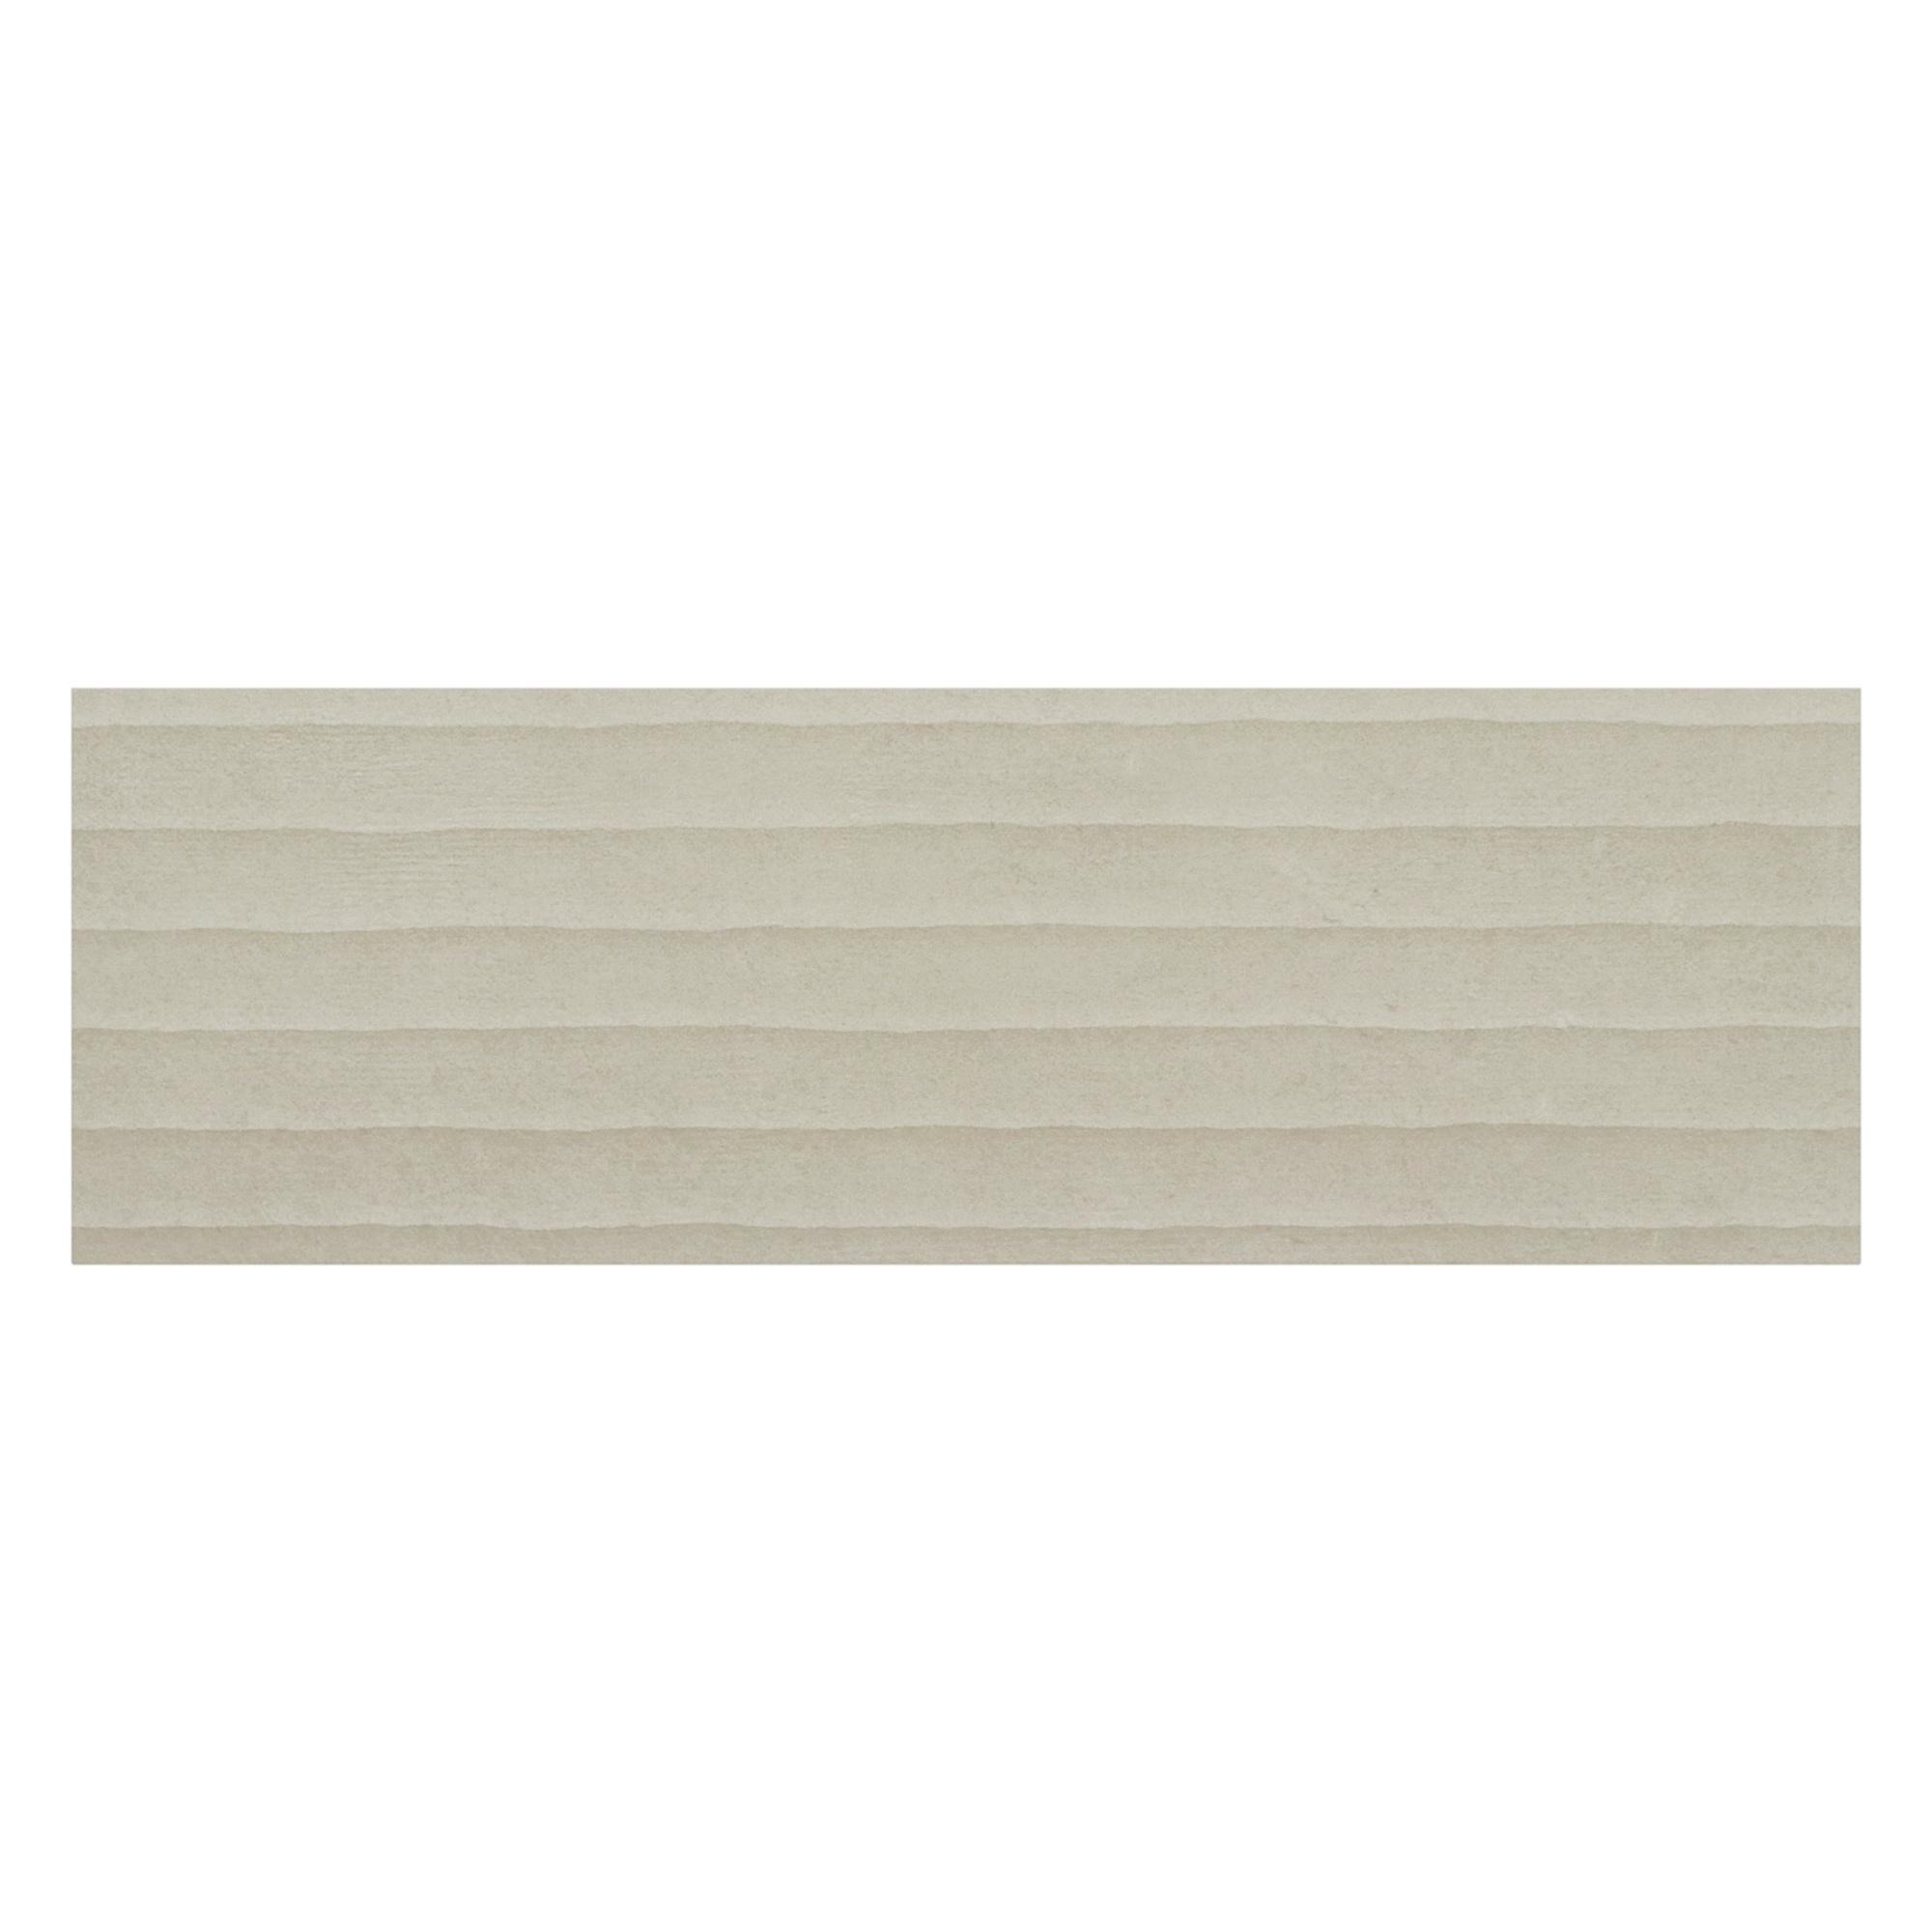 Плитка настенная Cifre relieve accord ivory 25x75 плитка напольная cifre hampton almond 22 5x60 уп11